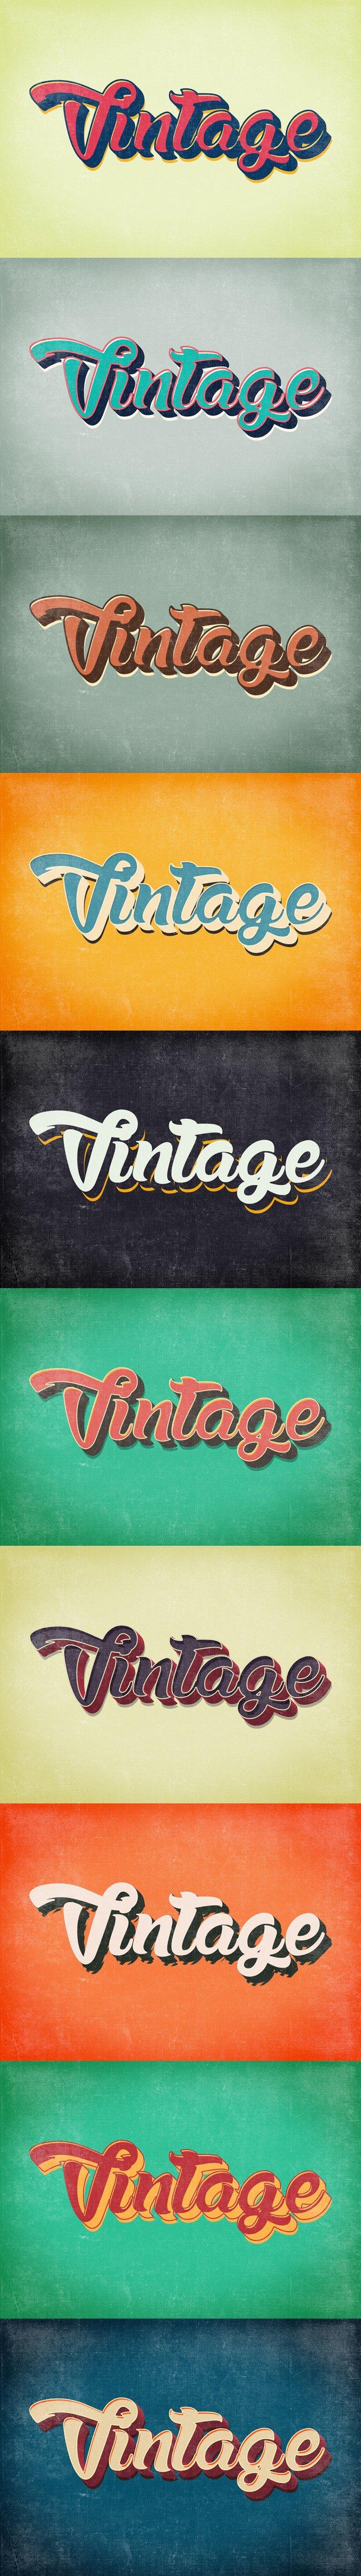 10 Vintage & Retro Text Styles (.Psd) скачать бесплатно